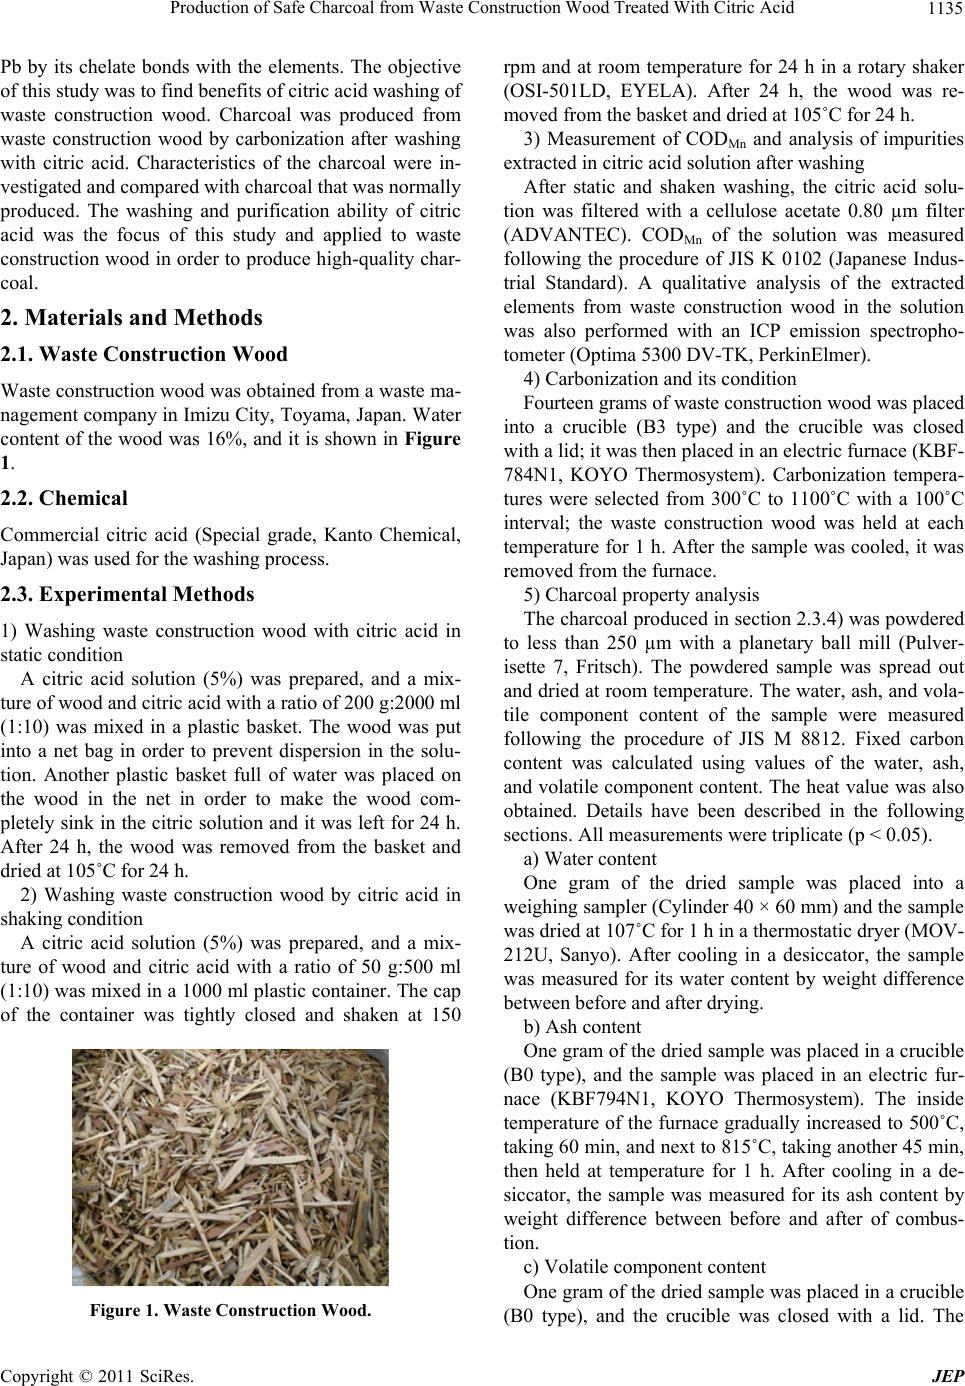 production of citric acid pdf